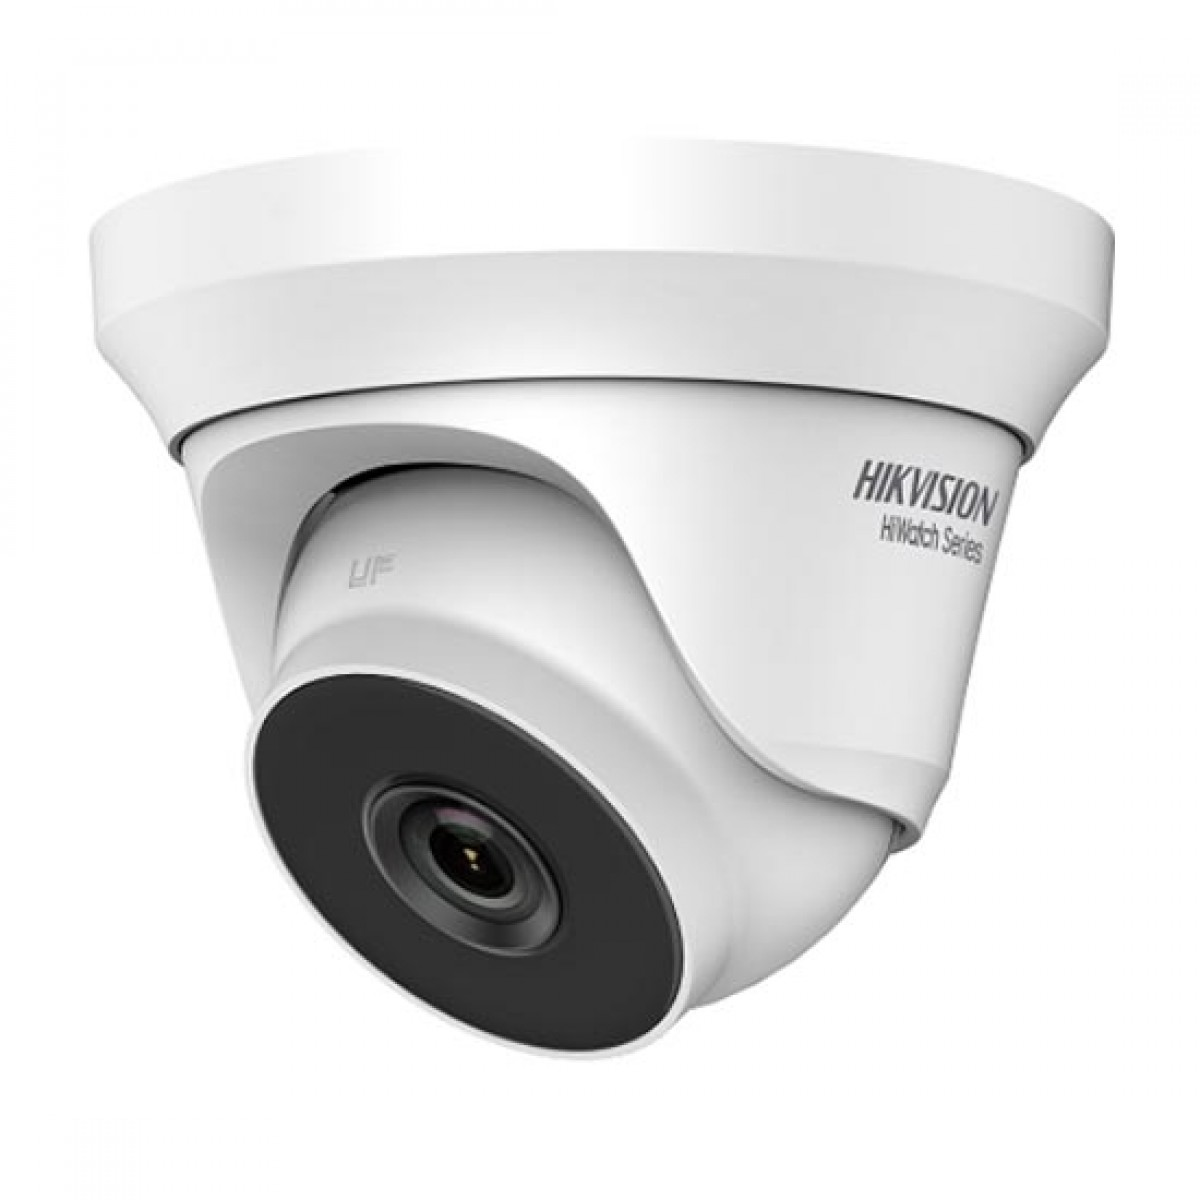 Hikvision HiWatch Telecamera Dome 4Mp Tvi 2.8-12mm Ir 40m HWT-D340-VF